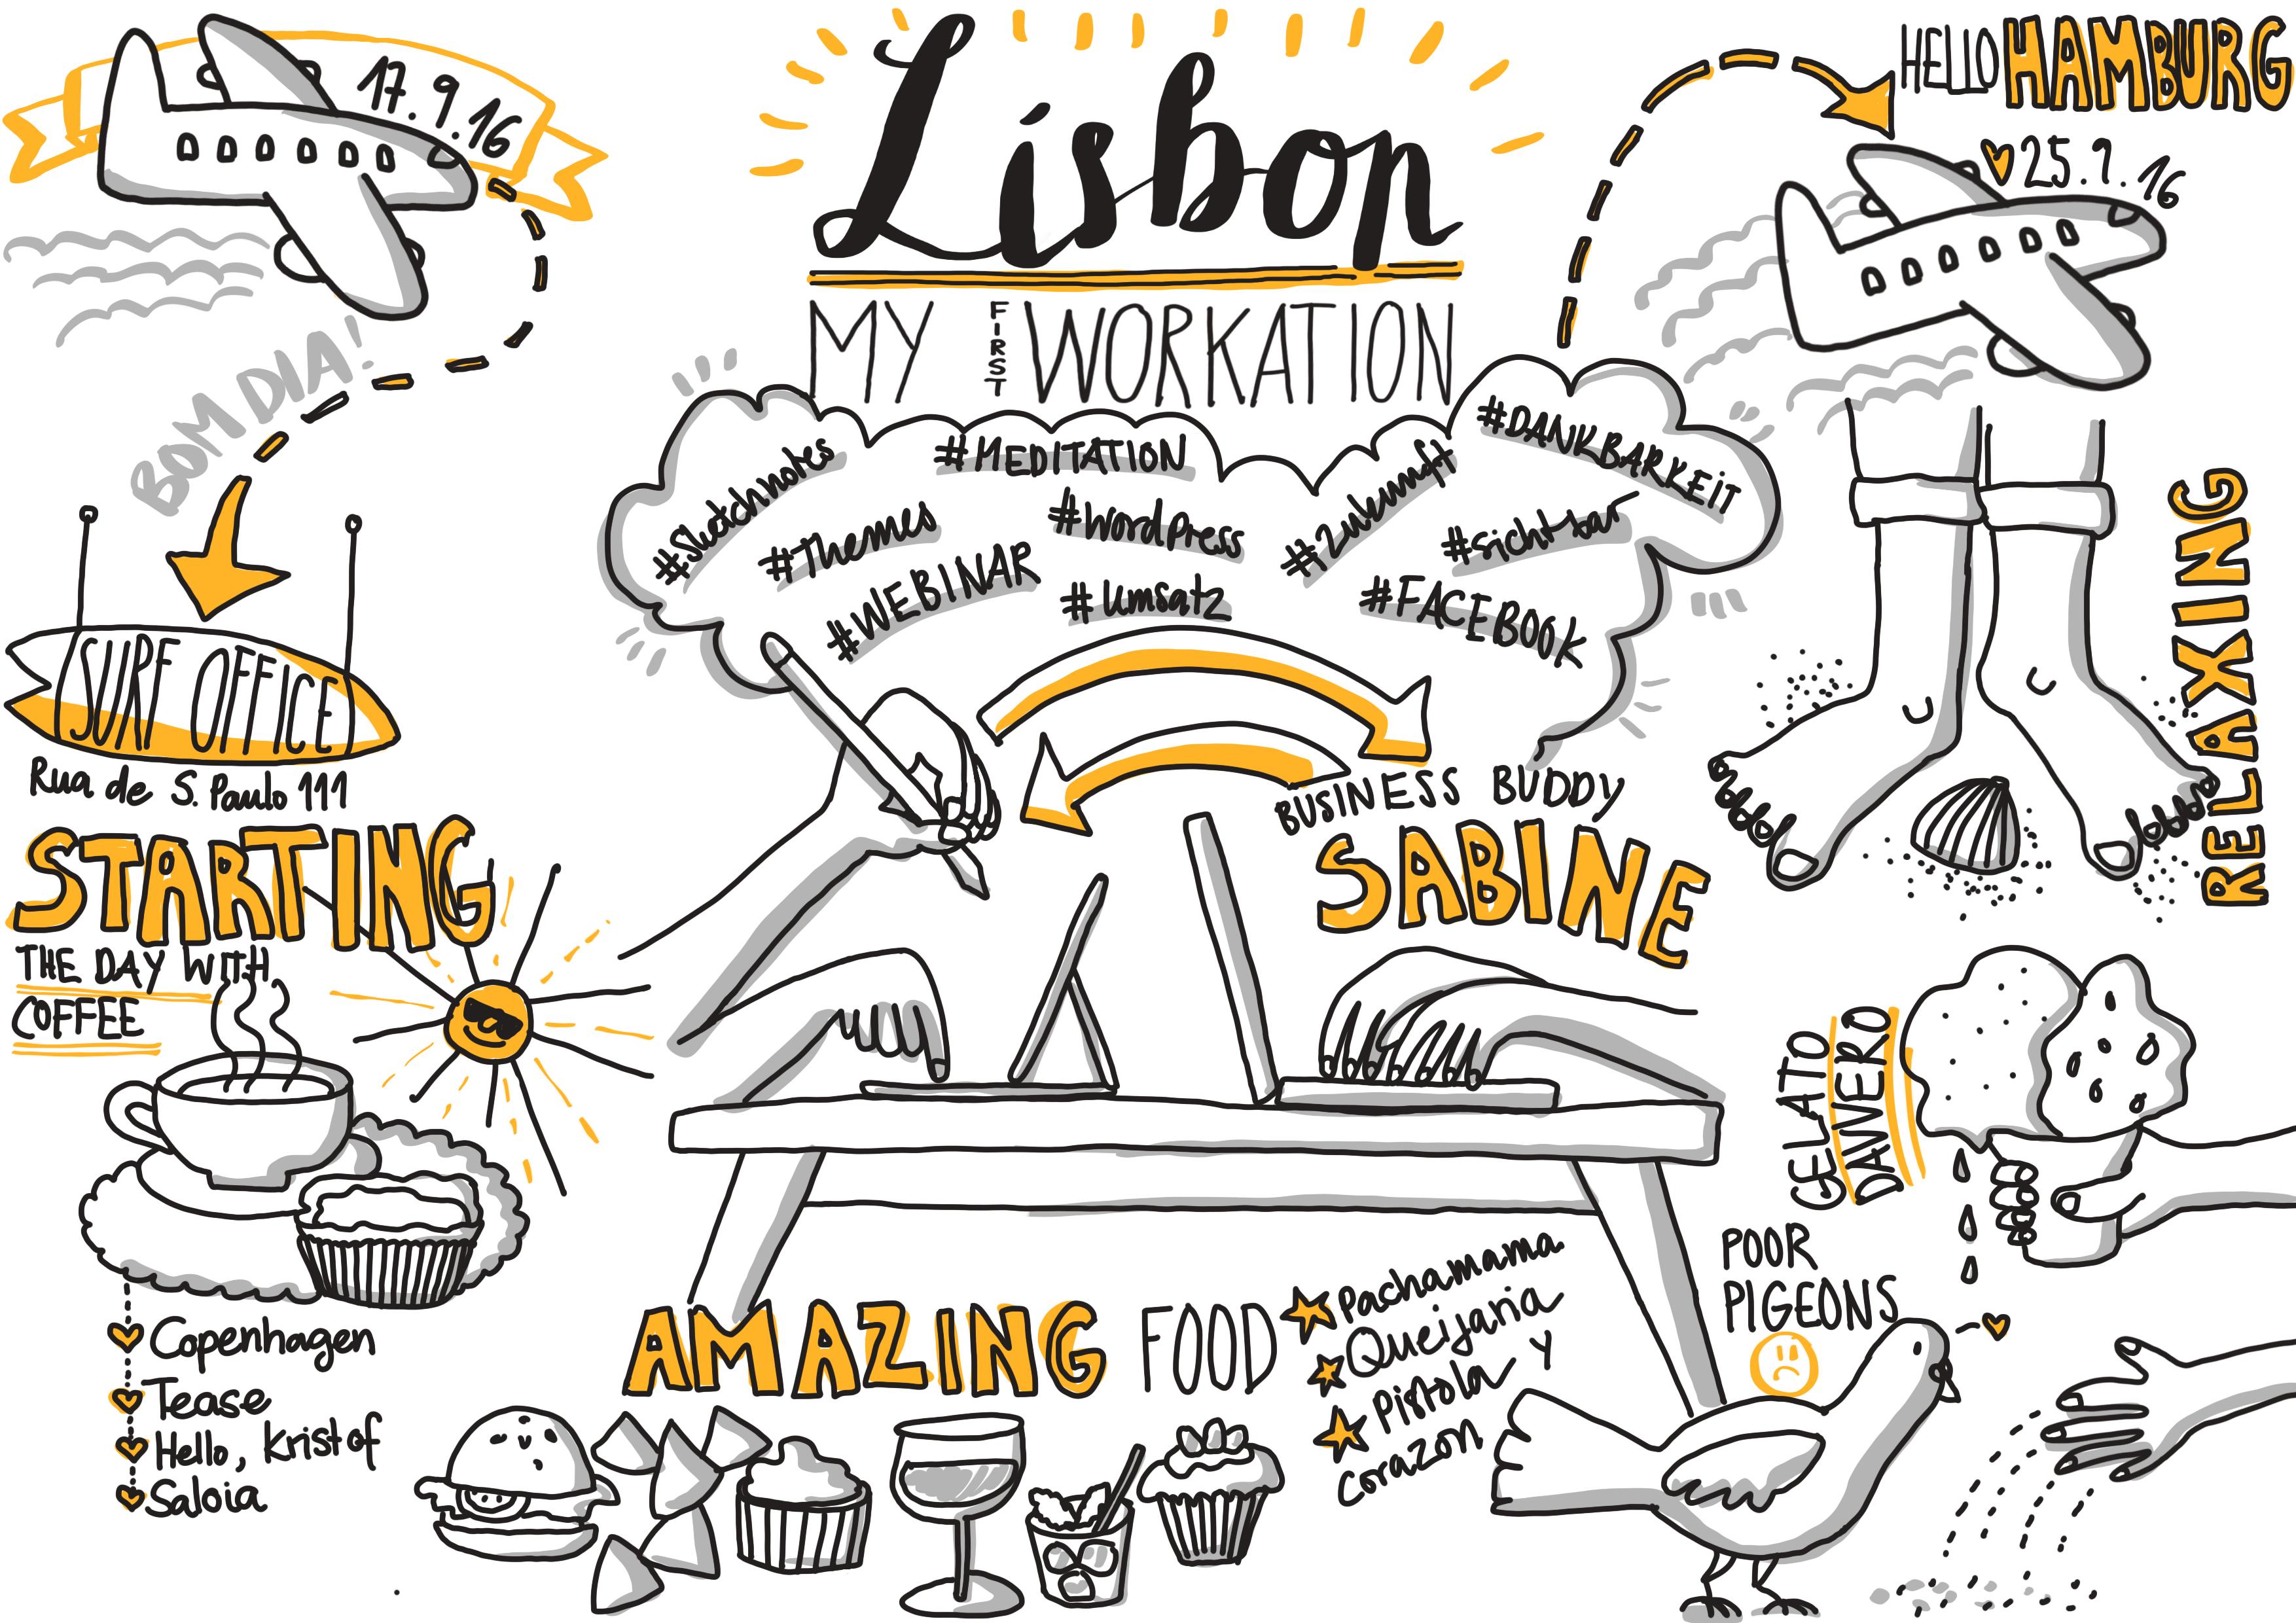 Workation Lissabon - Sketchnotemafia